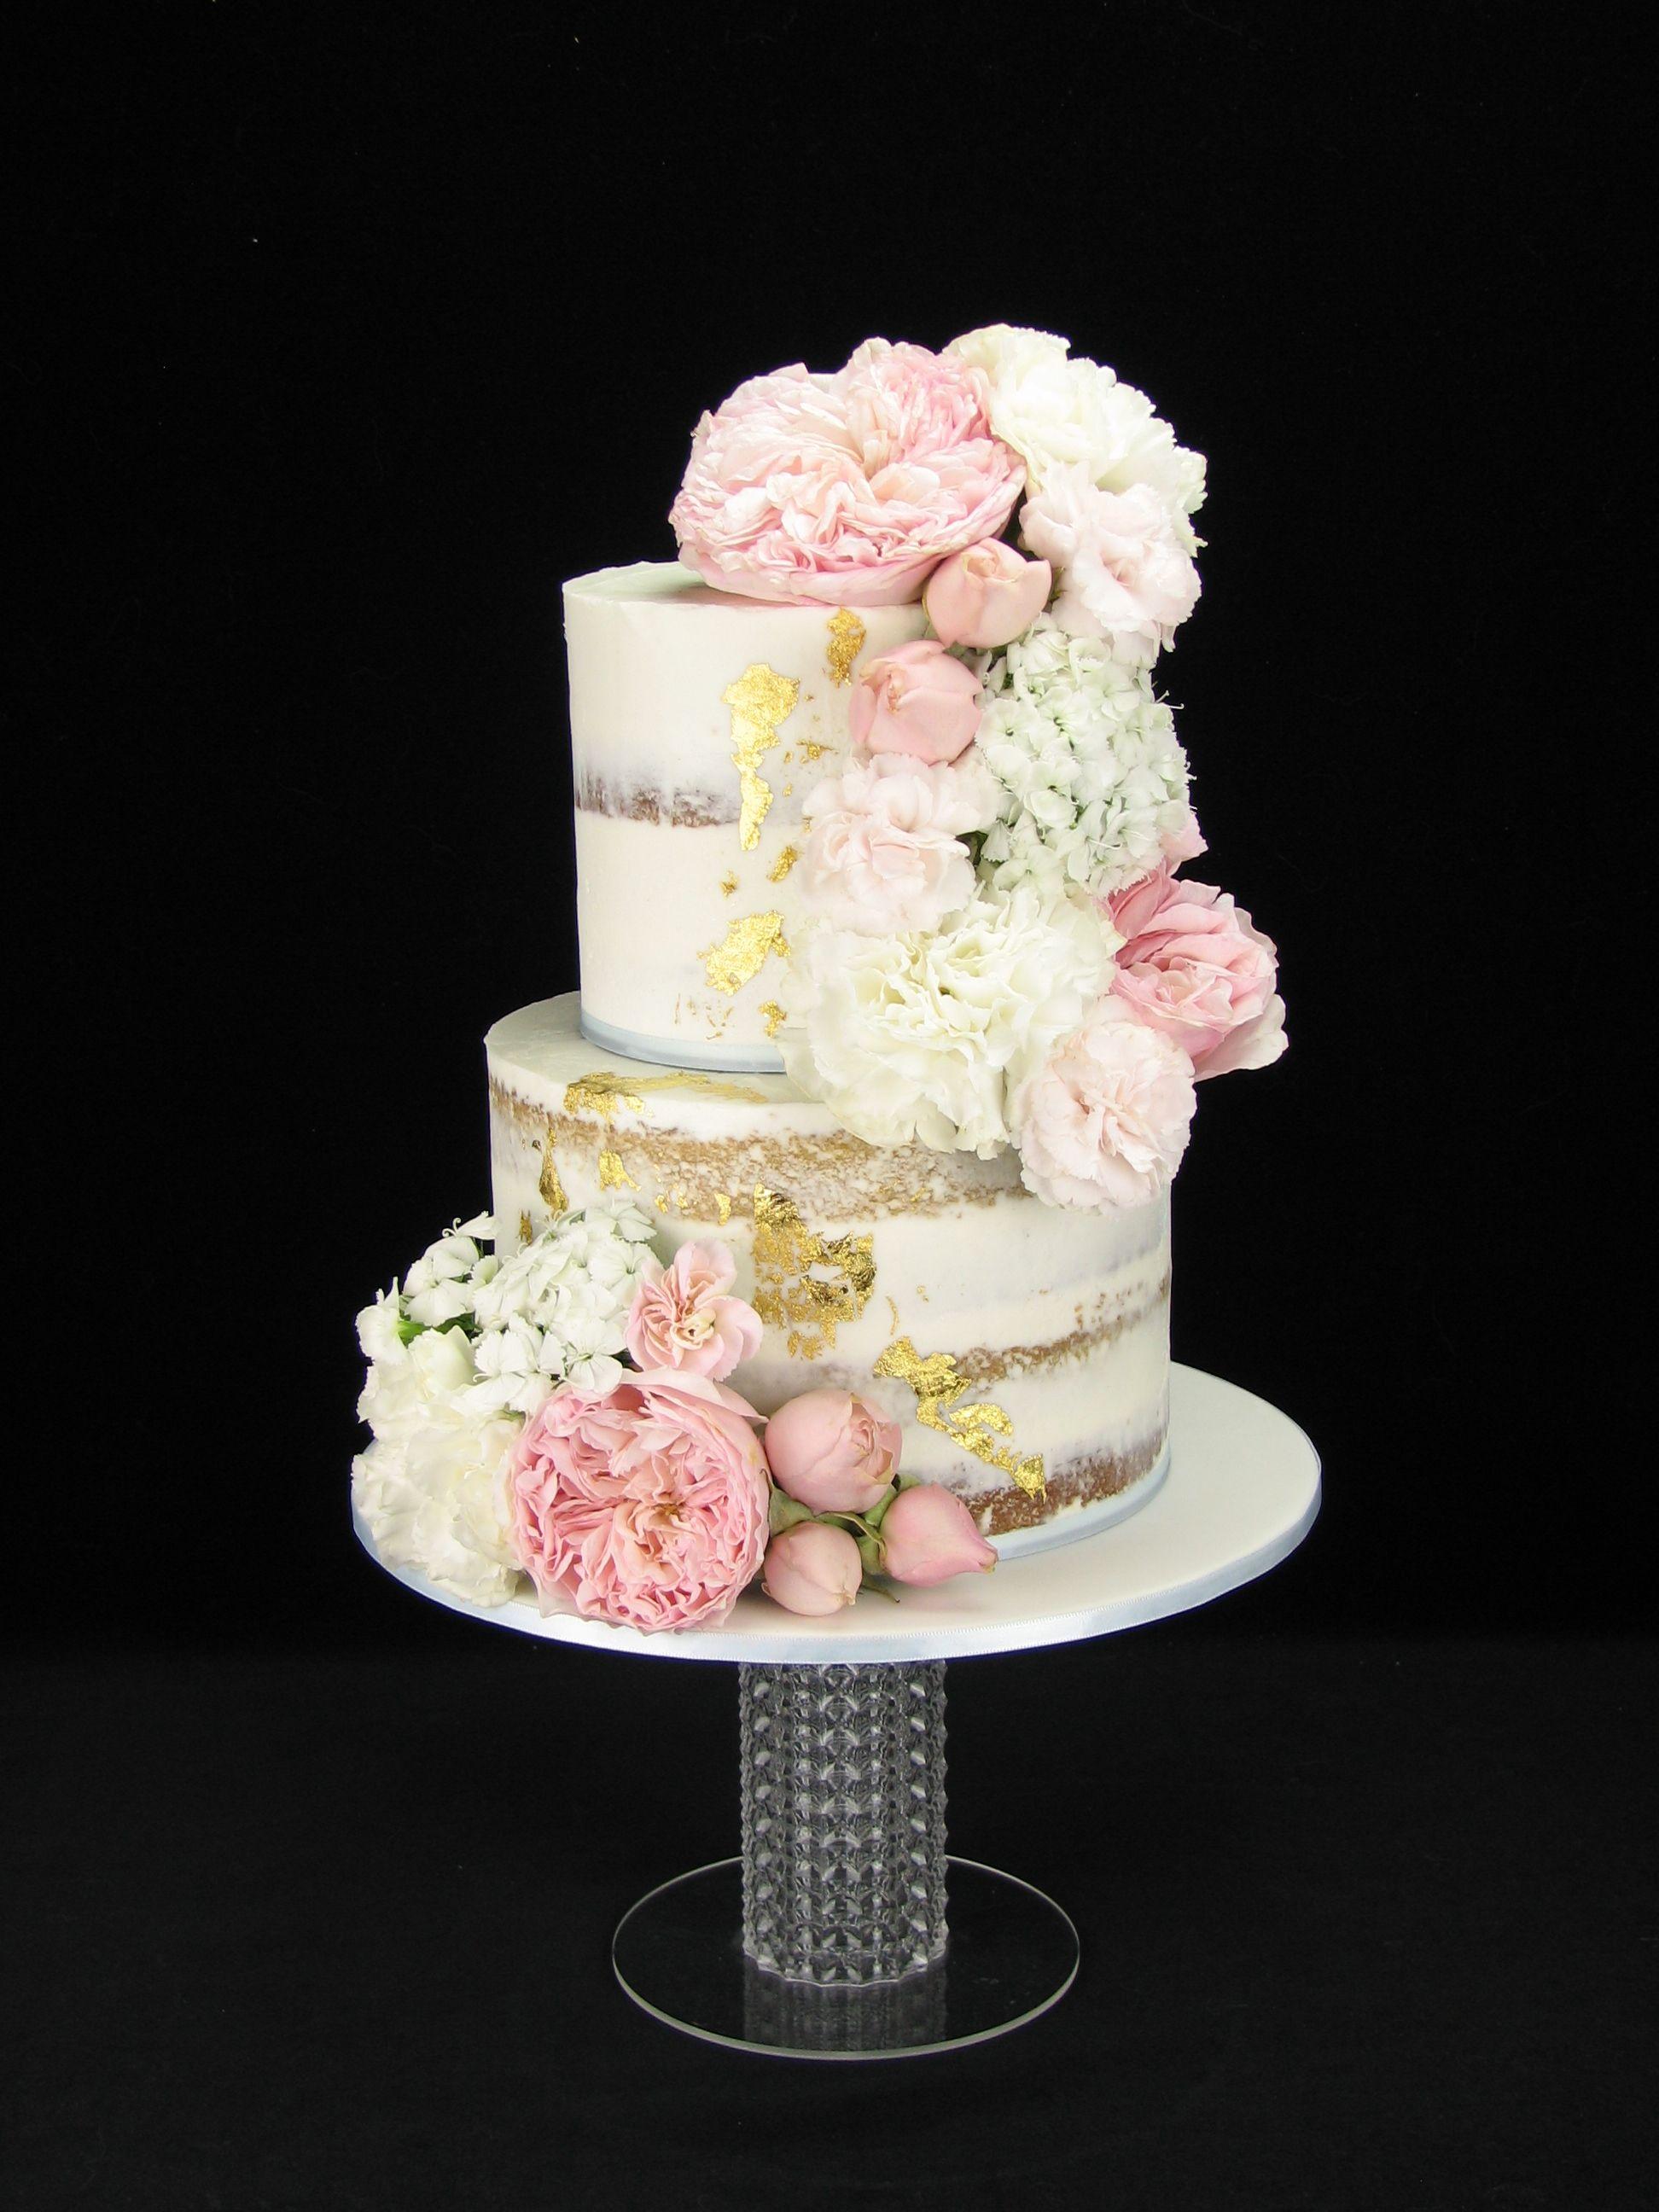 Semi Naked Cake A Gorgeous Caramel Mudcake For Shelleys 21st It